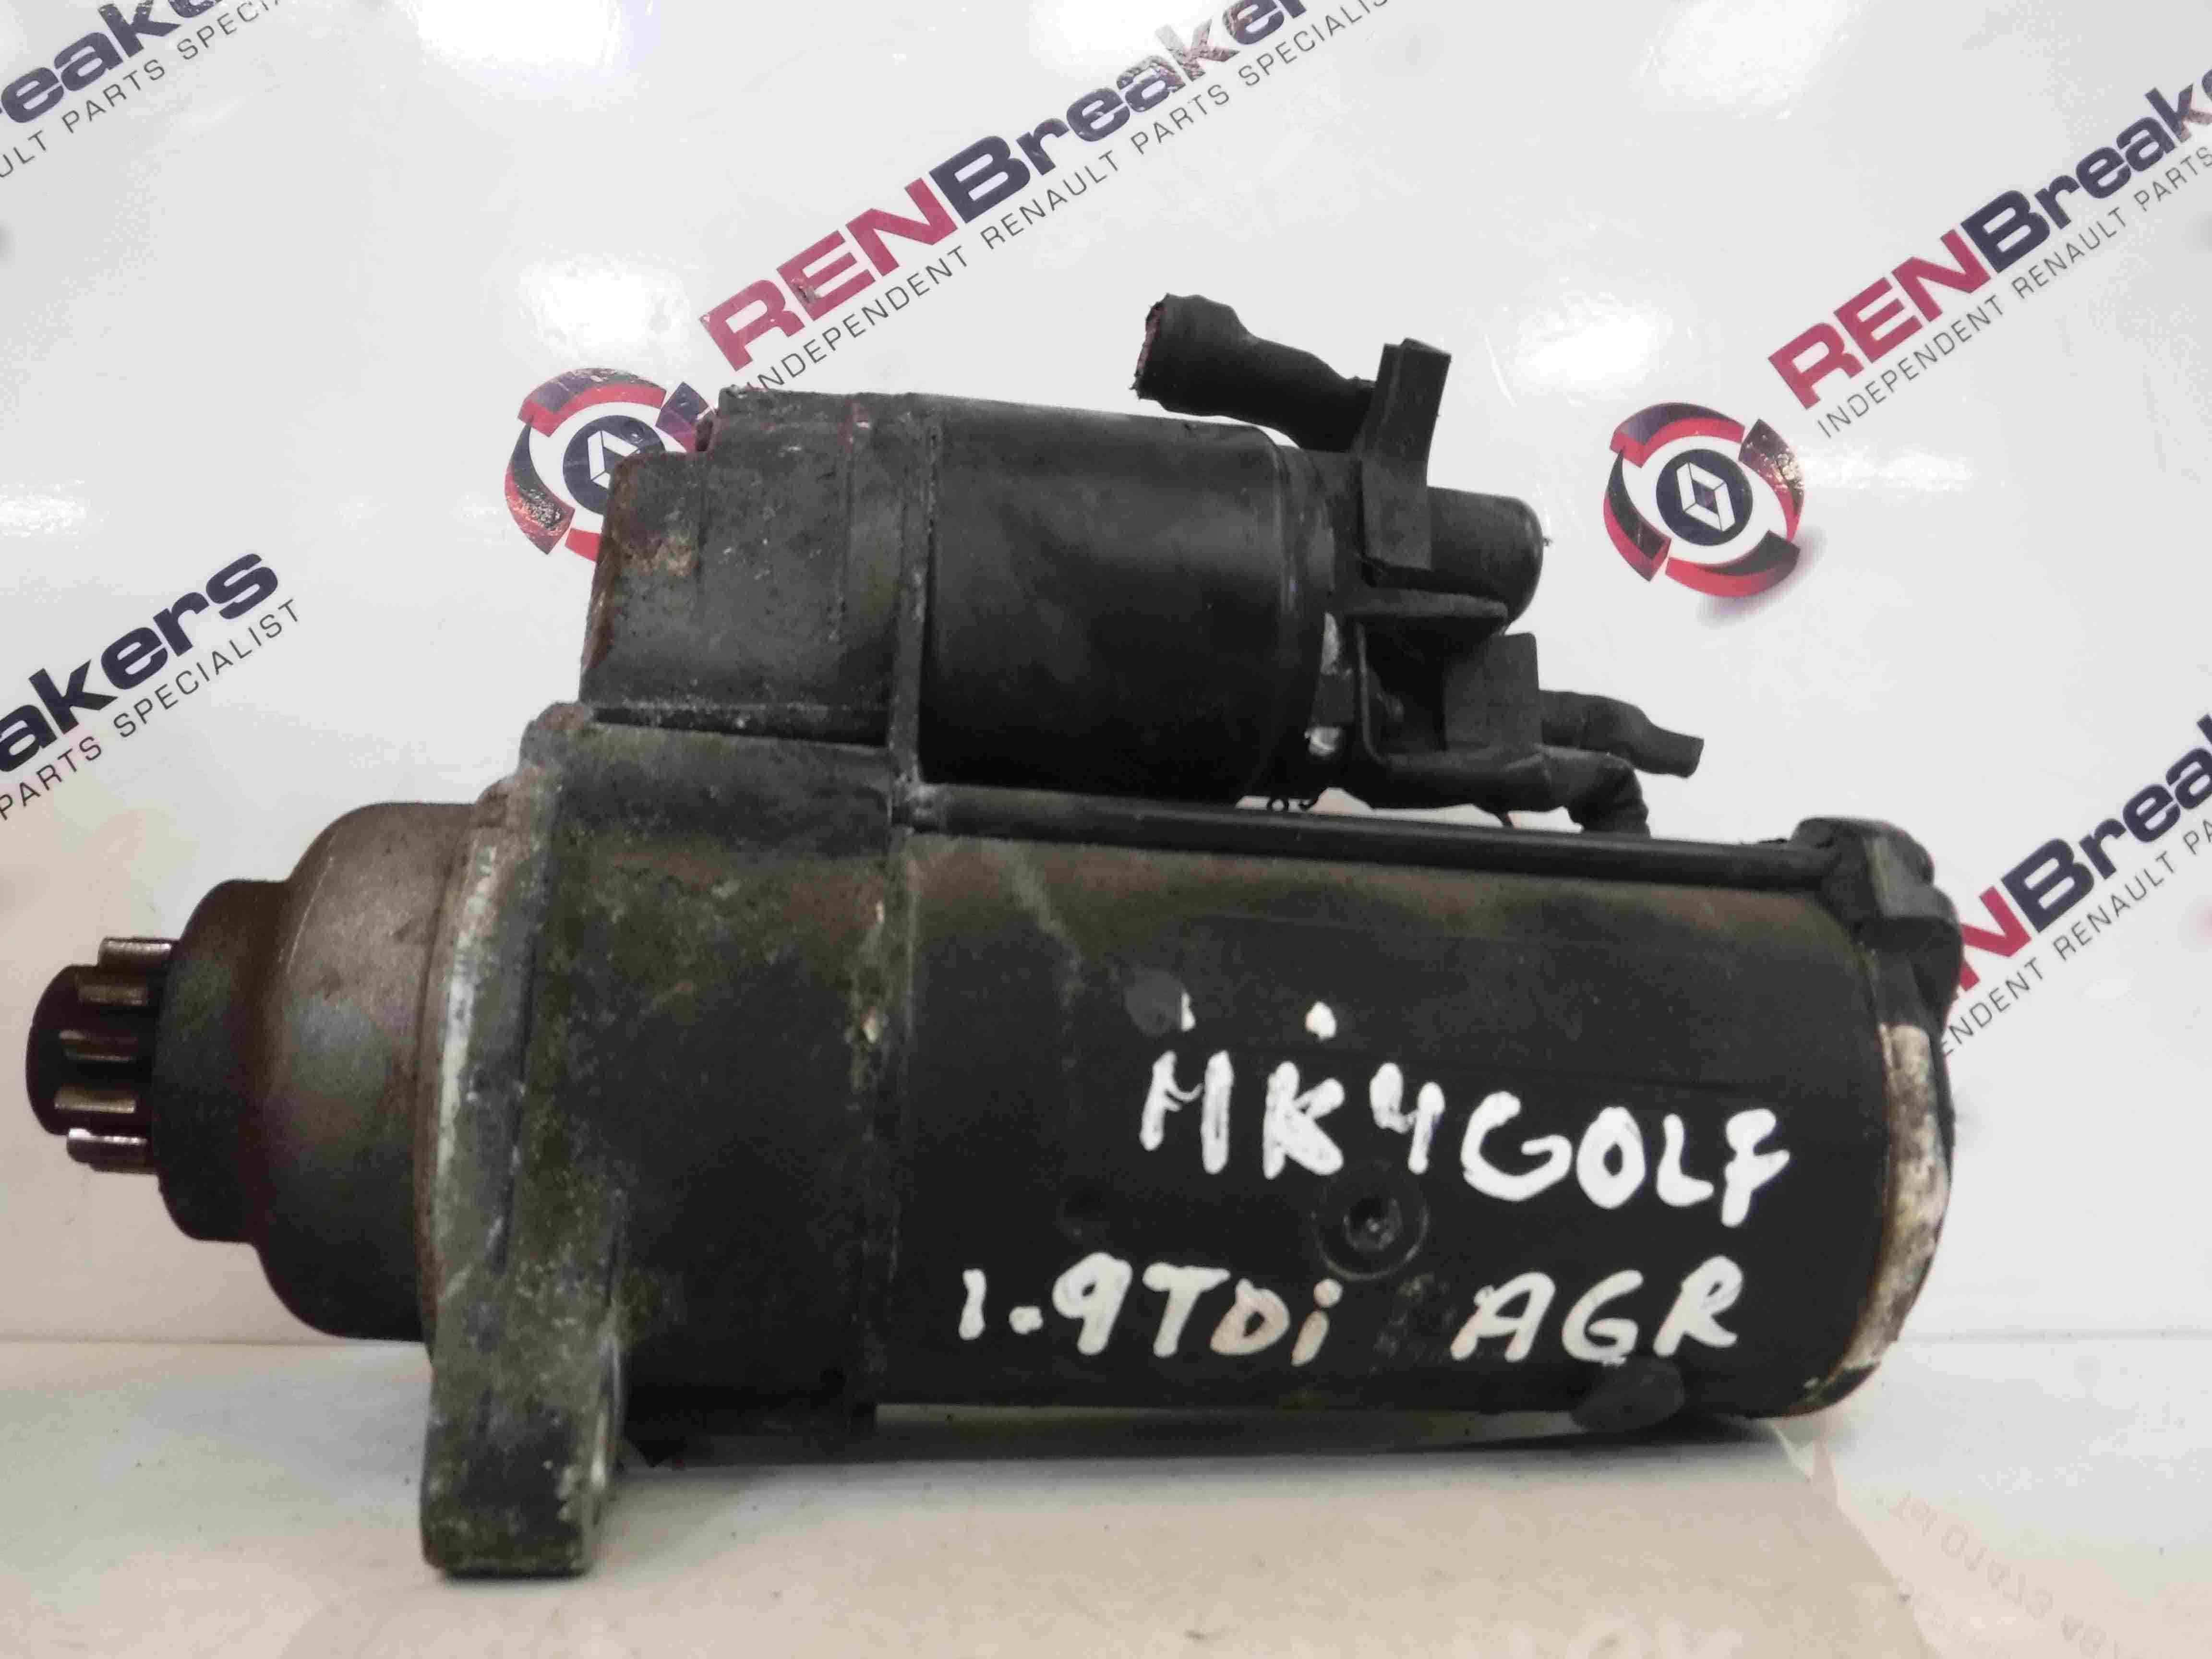 Volkswagen Golf MK4 1997-2004 1.9 tDi Starter Motor Starting ASZ 02M911023C